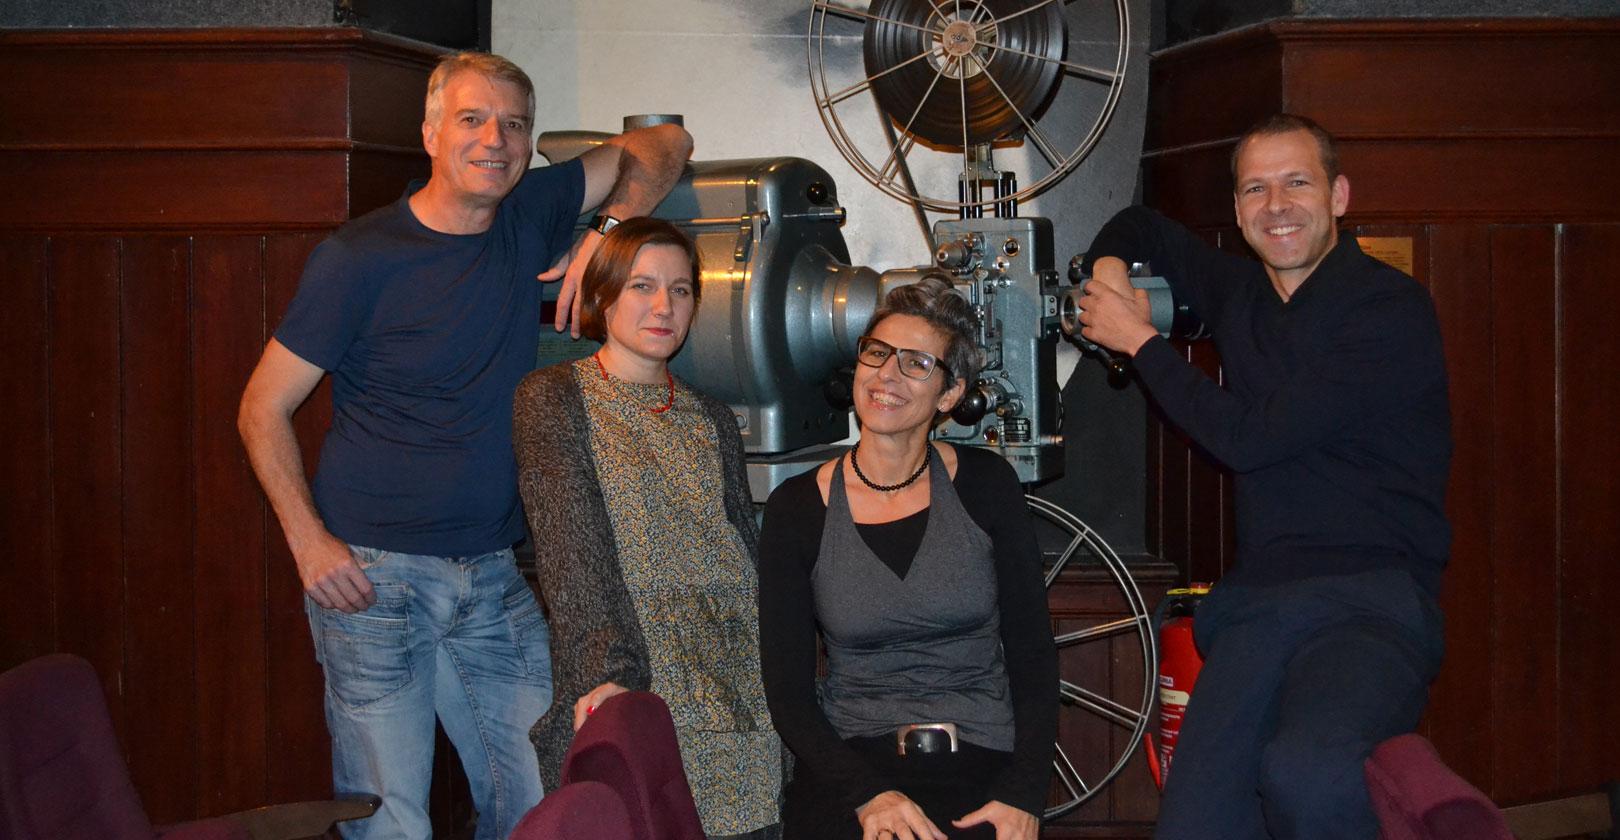 Sofiia Melnyk, Carolin Schattenkirchner, Helge Thun